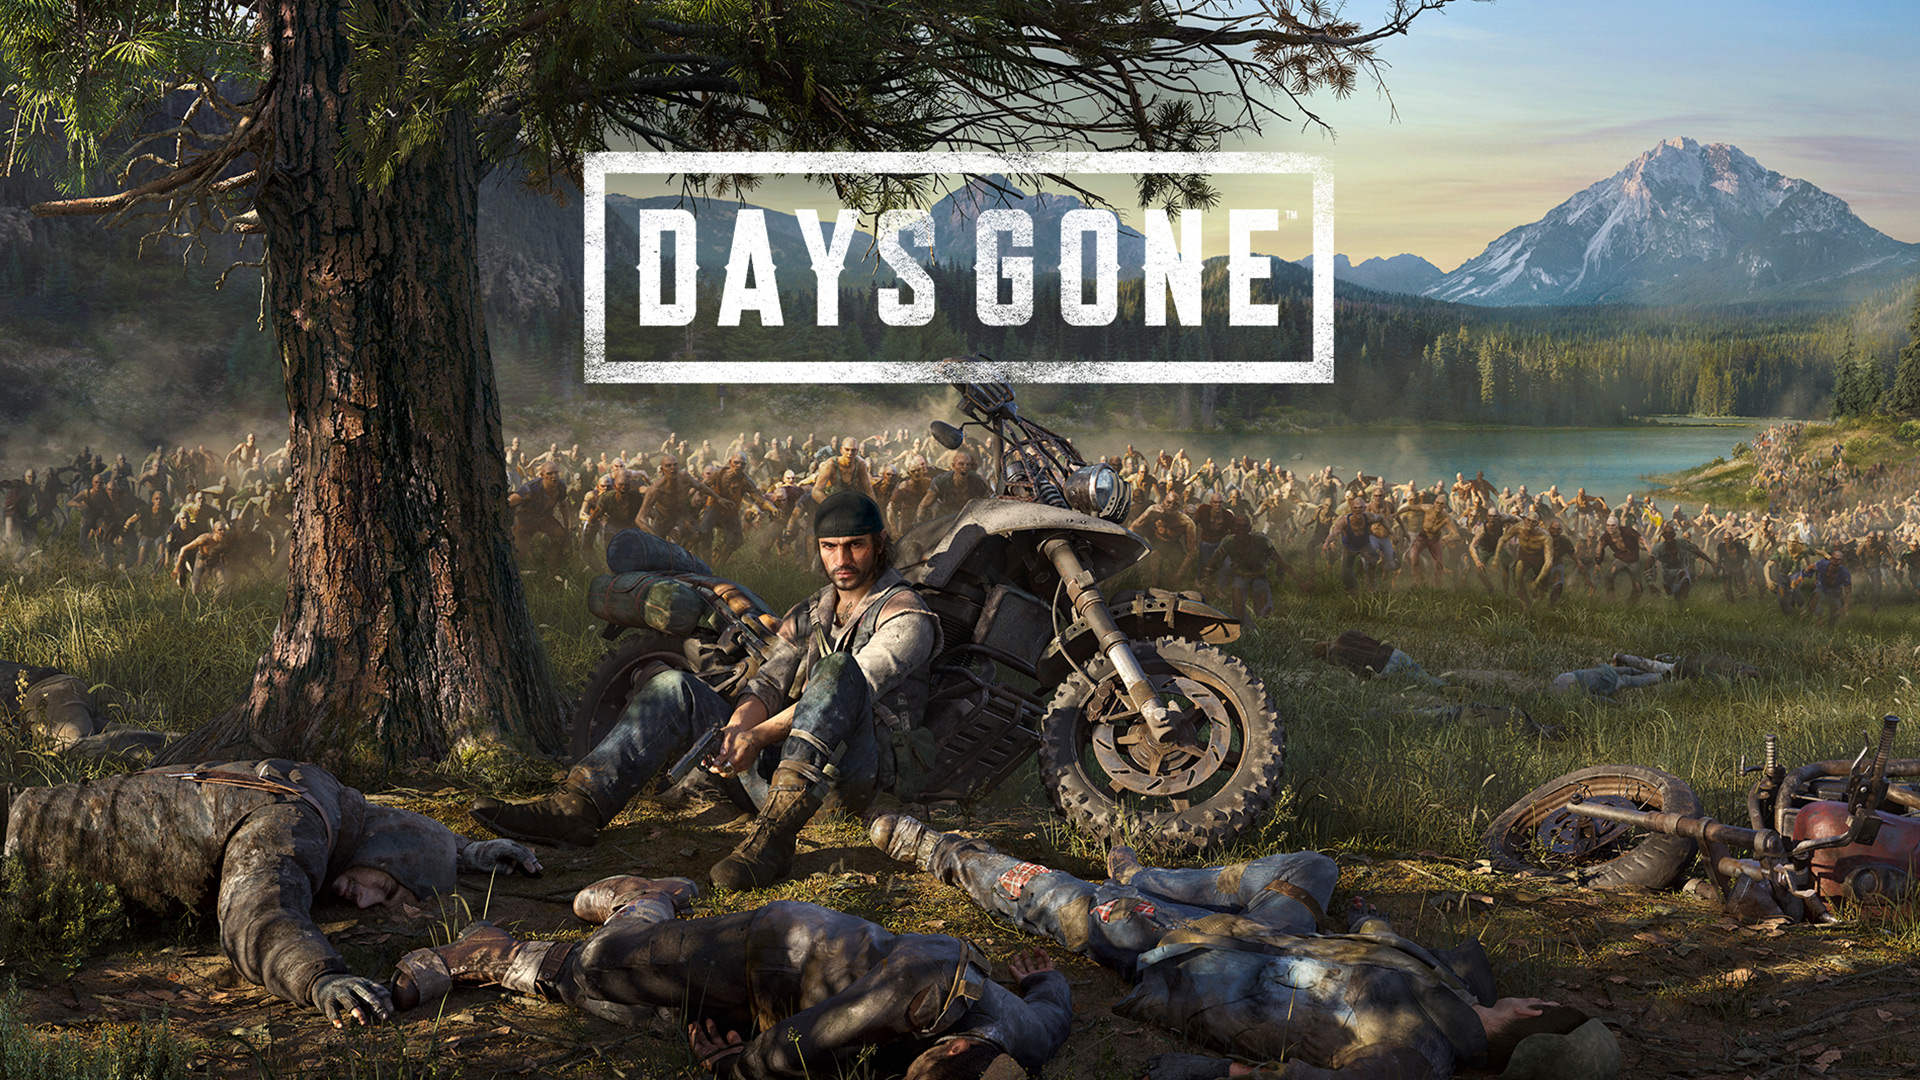 Days-gone-sony-artwork-packaging